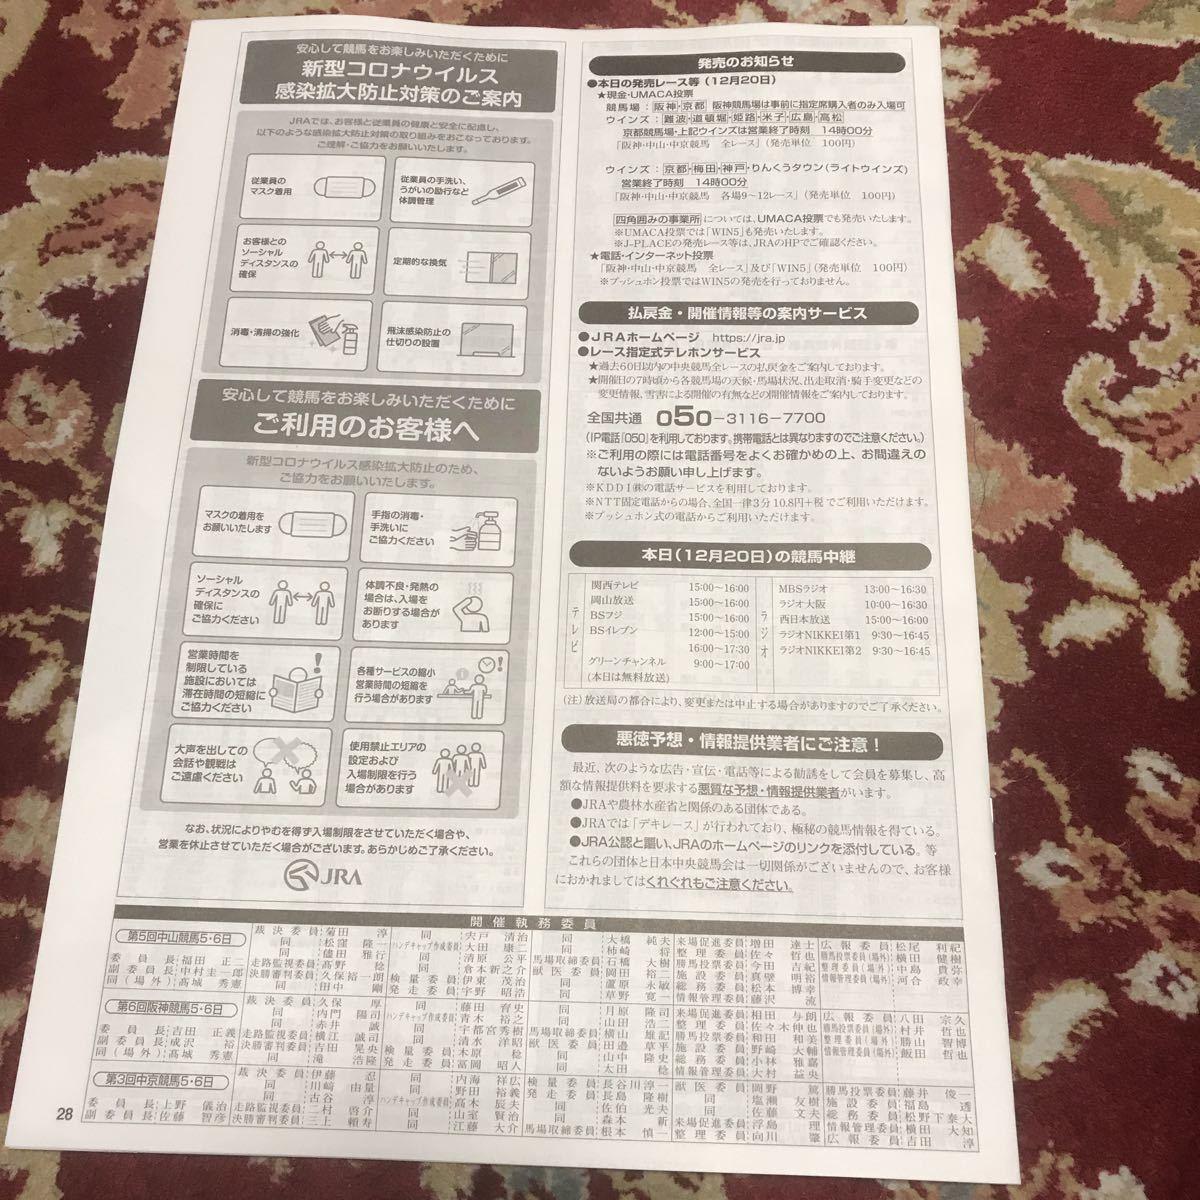 JRAレーシングプログラム2020.12.20(日)朝日杯フューチュリティステークス(GⅠ)、ディセンバーステークス(L)、三河ステークス_画像2